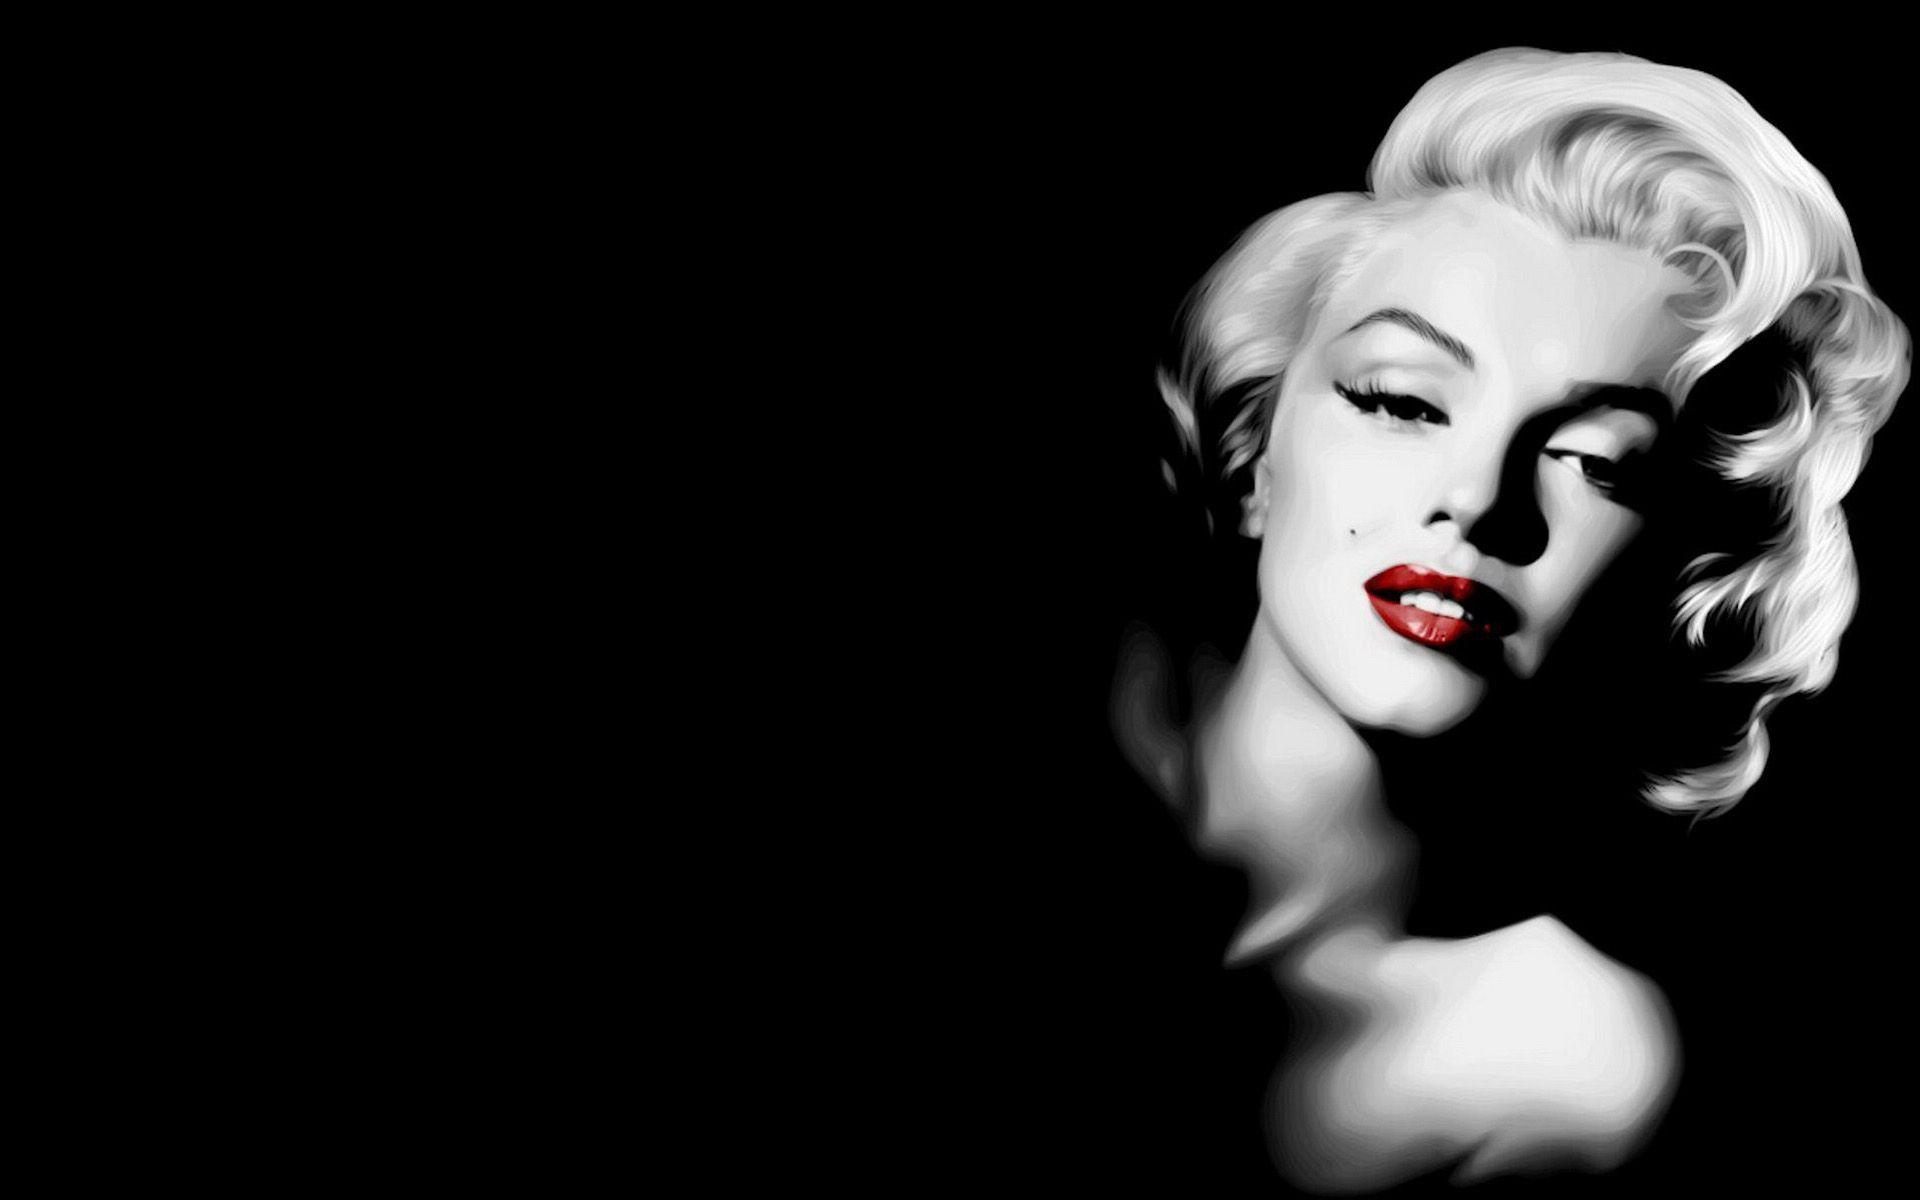 Fonds d'écran Marilyn Monroe tous les wallpapers Marilyn